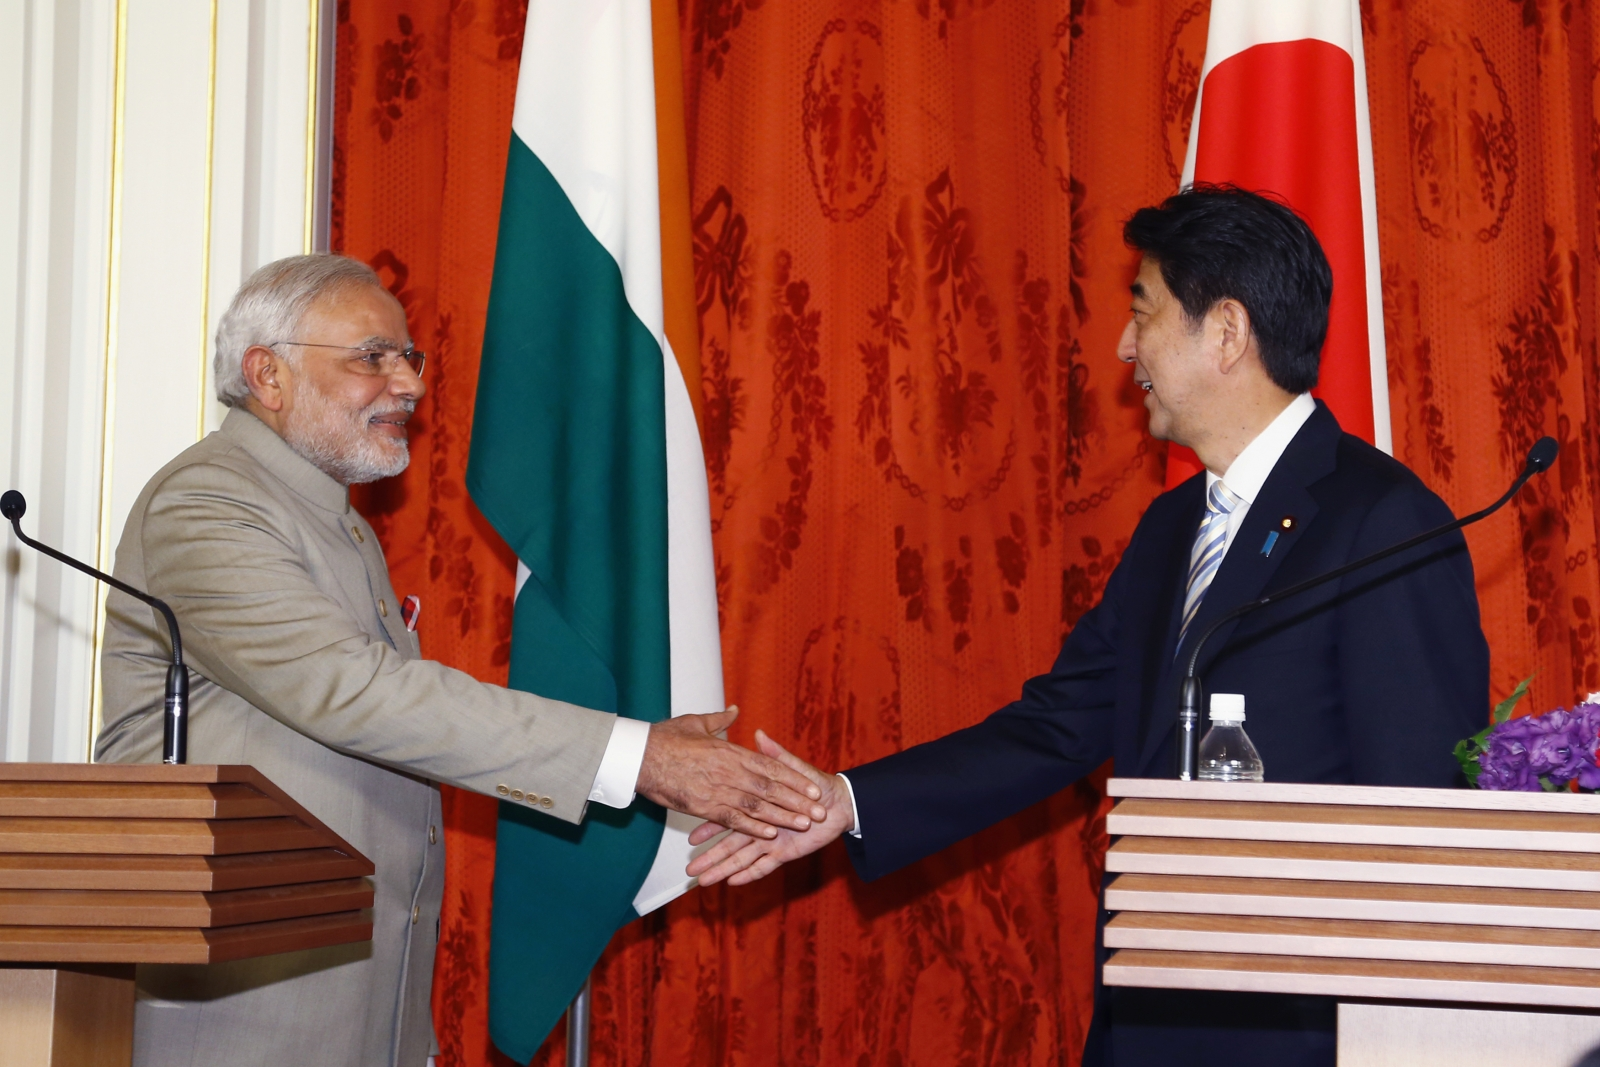 India's Prime Minister Narendra Modi (L) shakes hands with Japan's Prime Minister Shinzo Abe